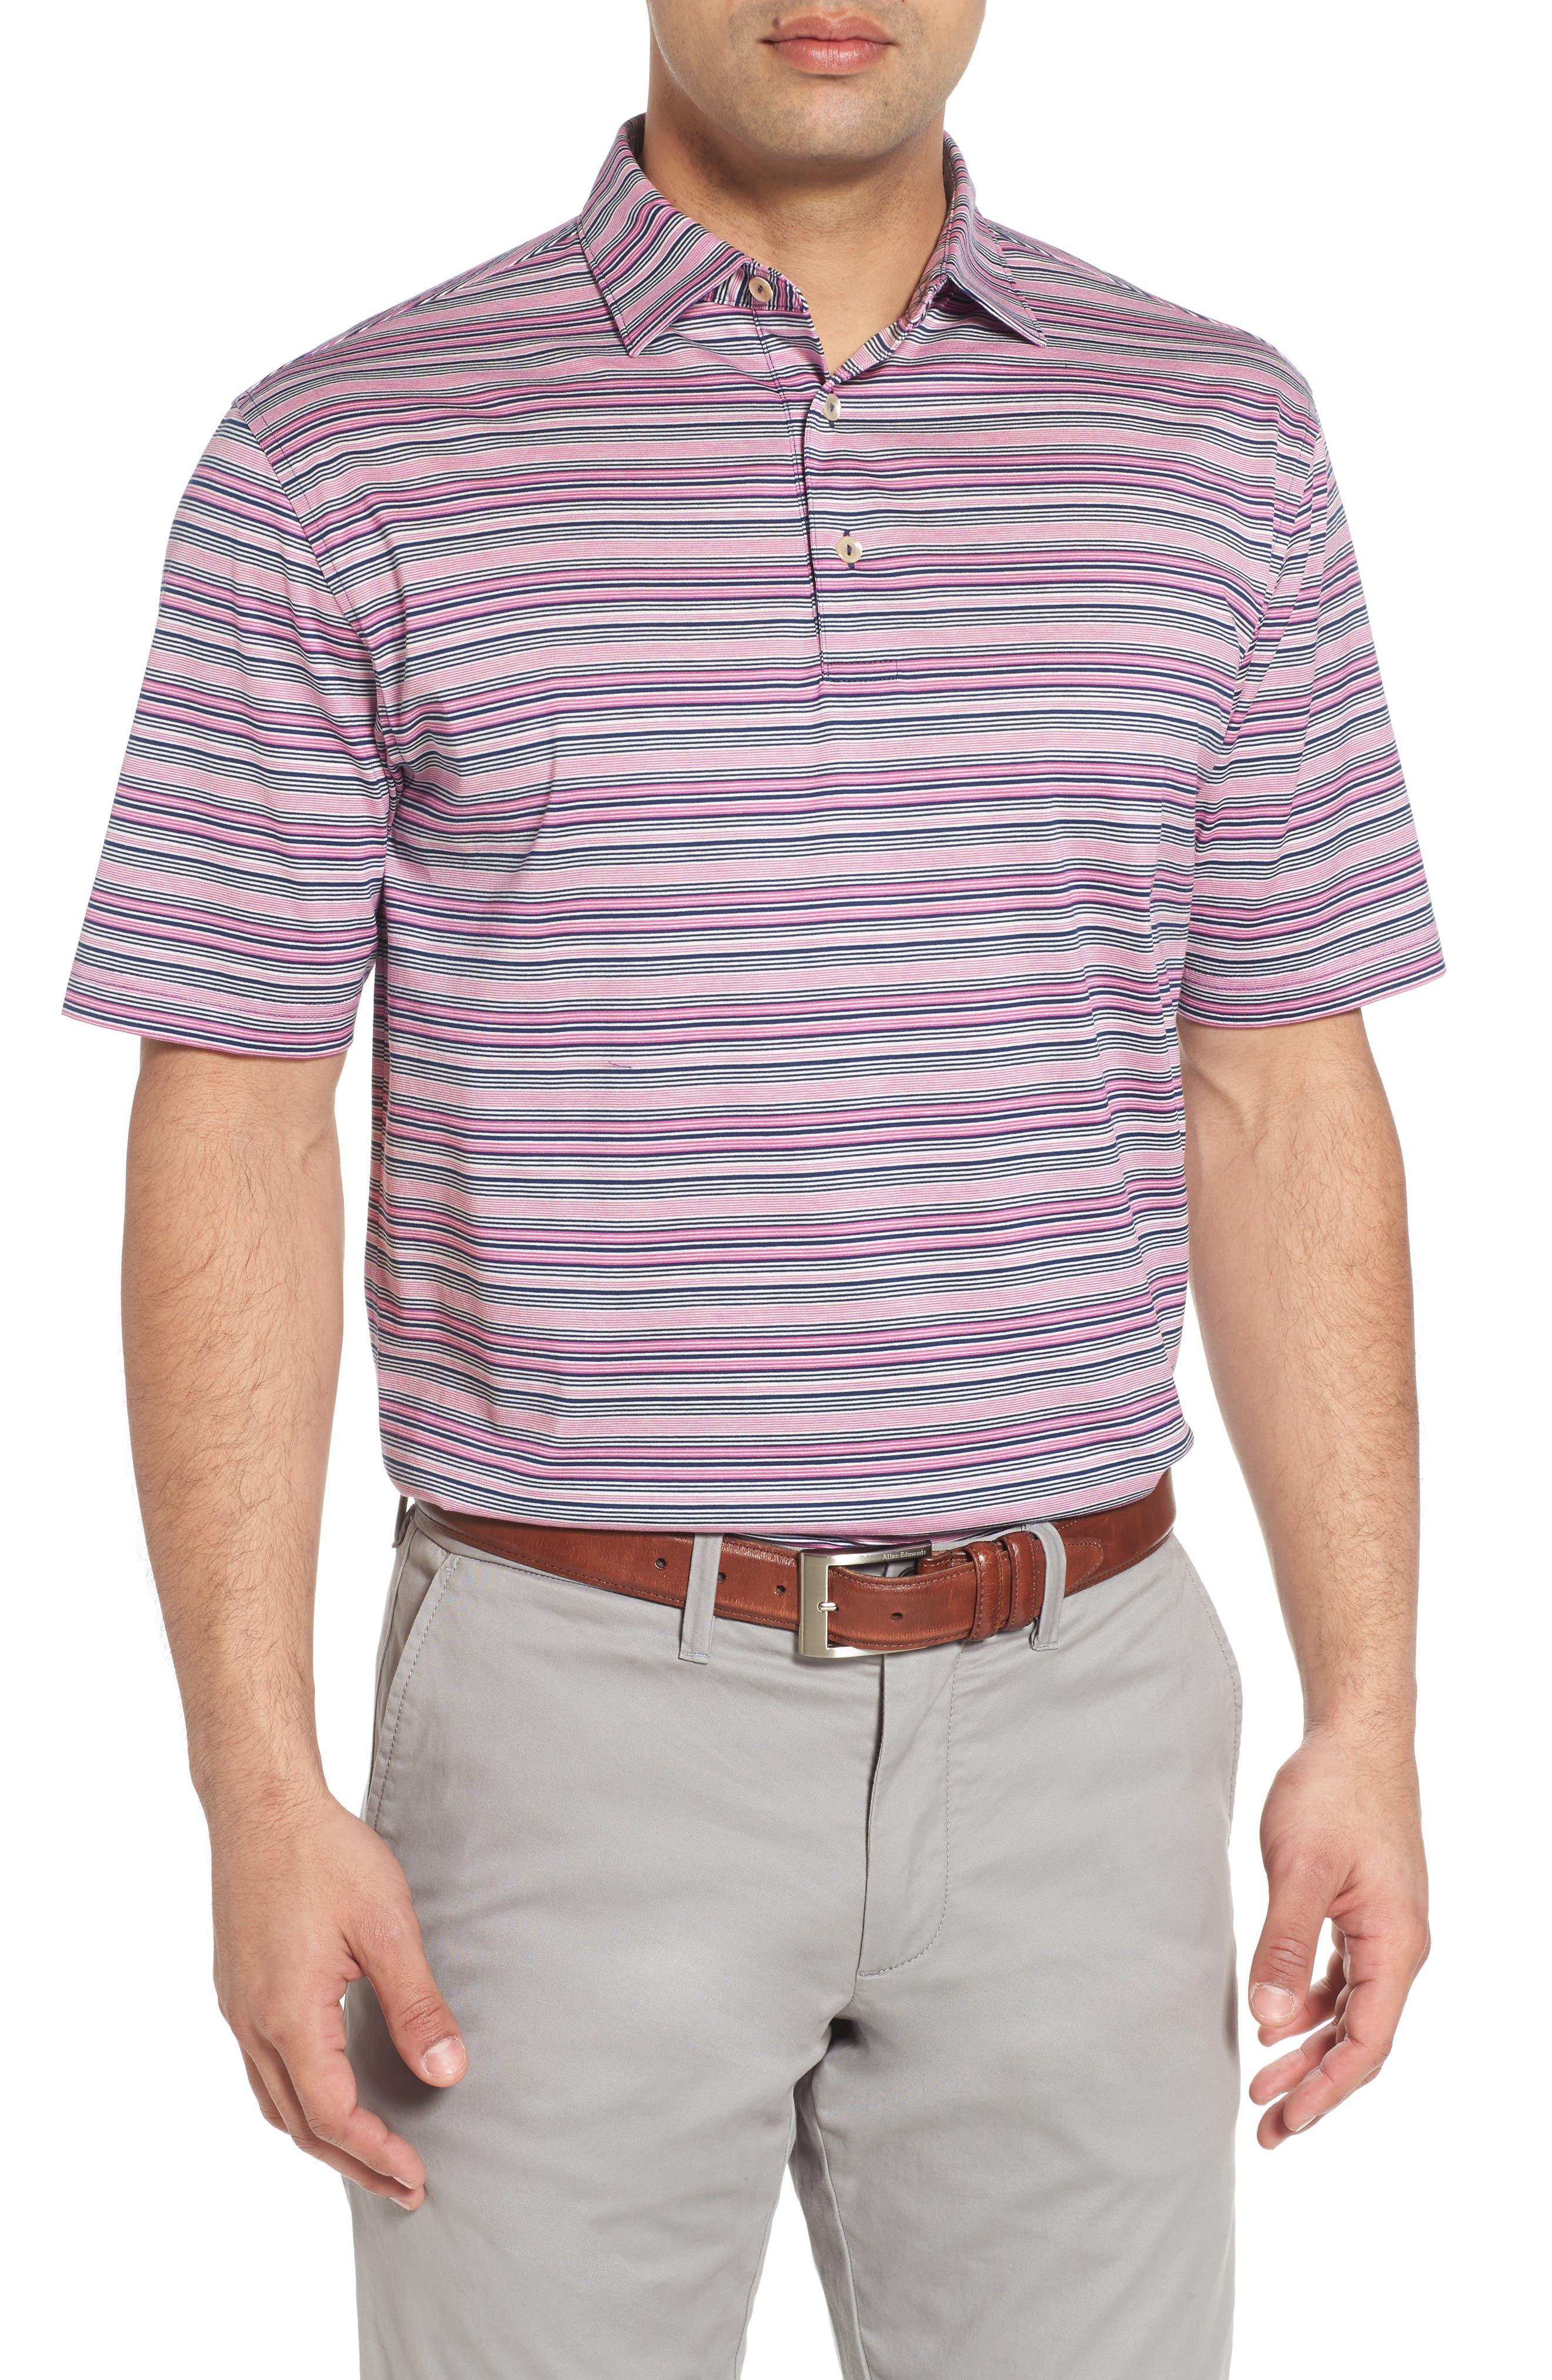 Sean Hanover Stripe Polo,                         Main,                         color, Barrier Blue